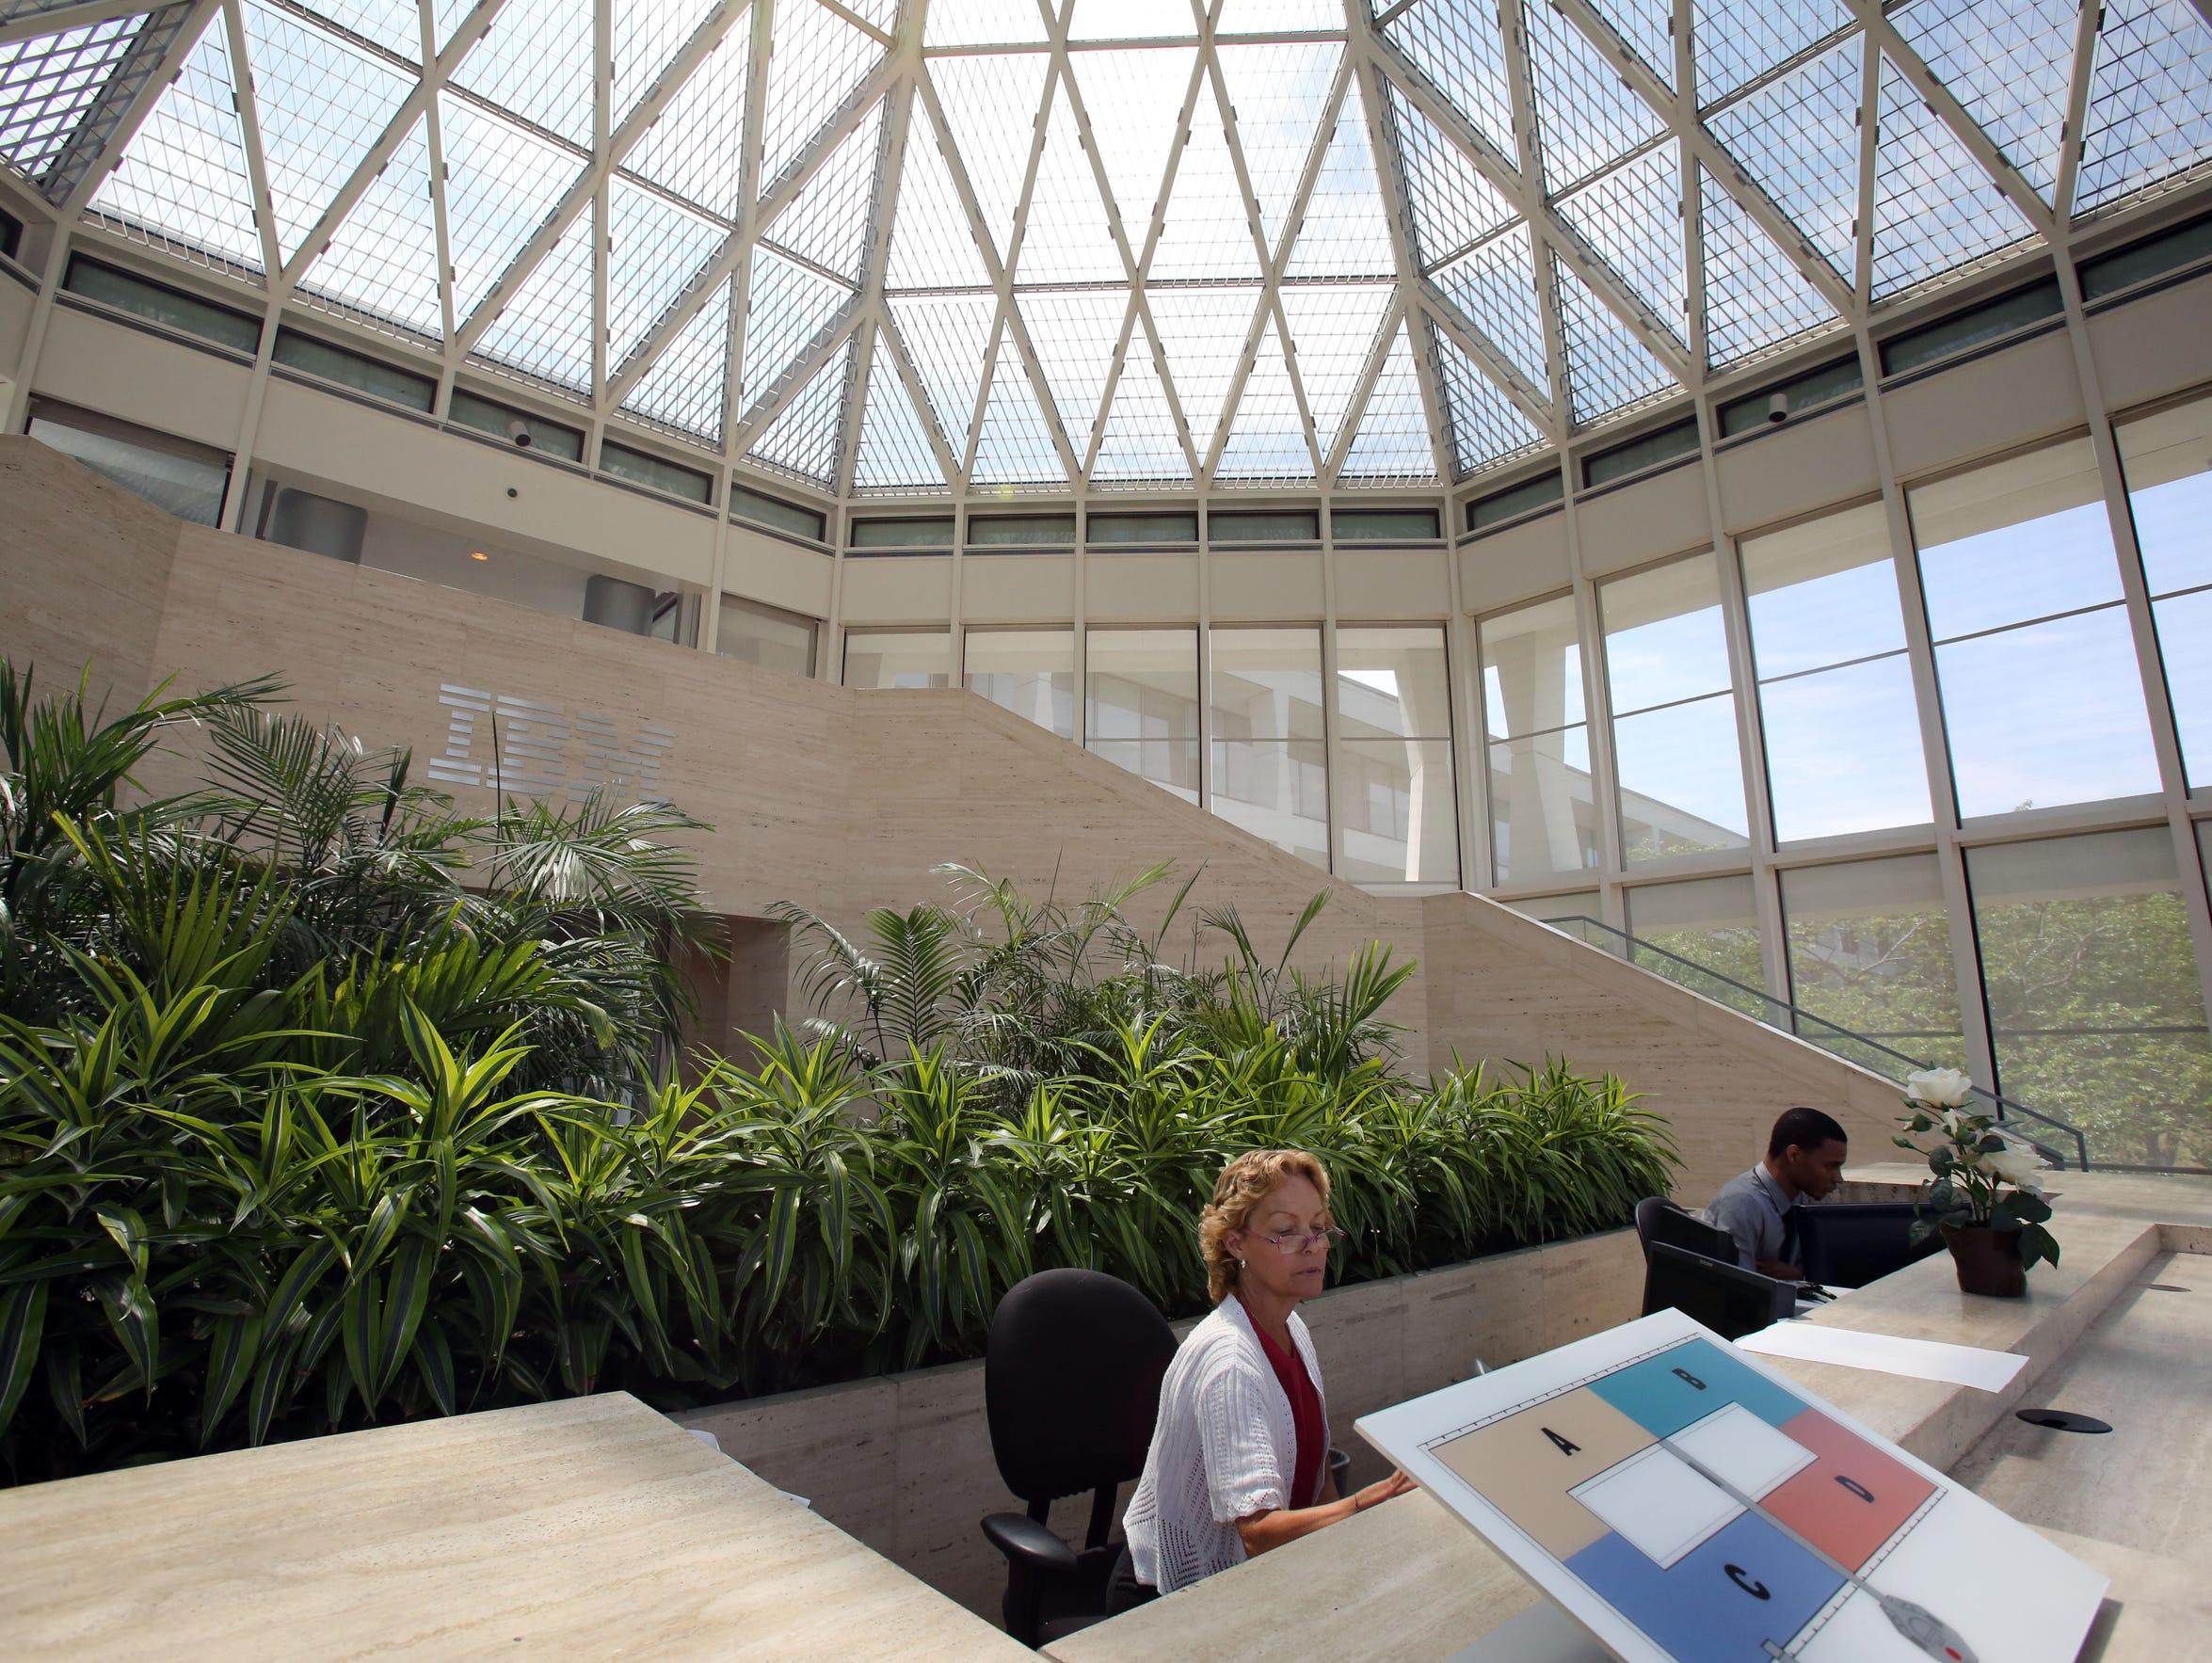 The atrium in the IBM building on the Armonk campus